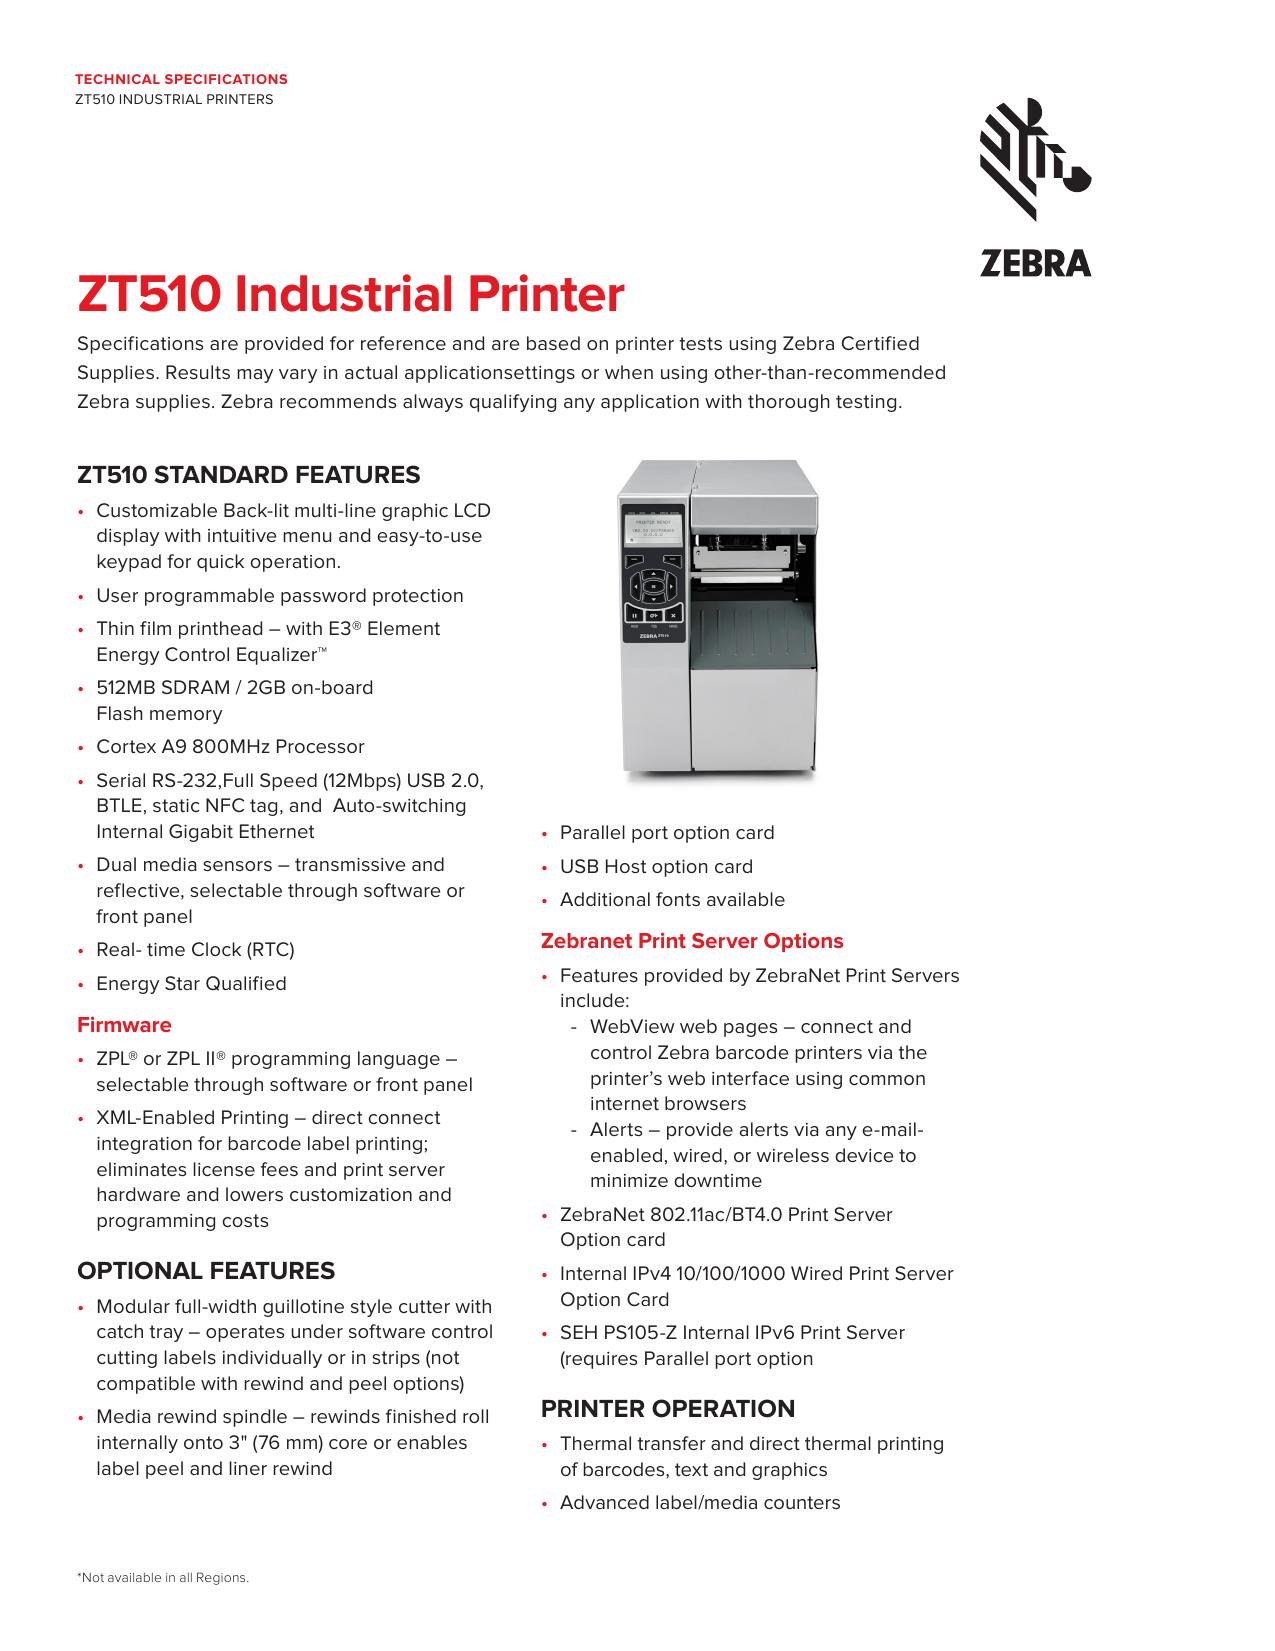 ZT510 Industrial Printer | manualzz com